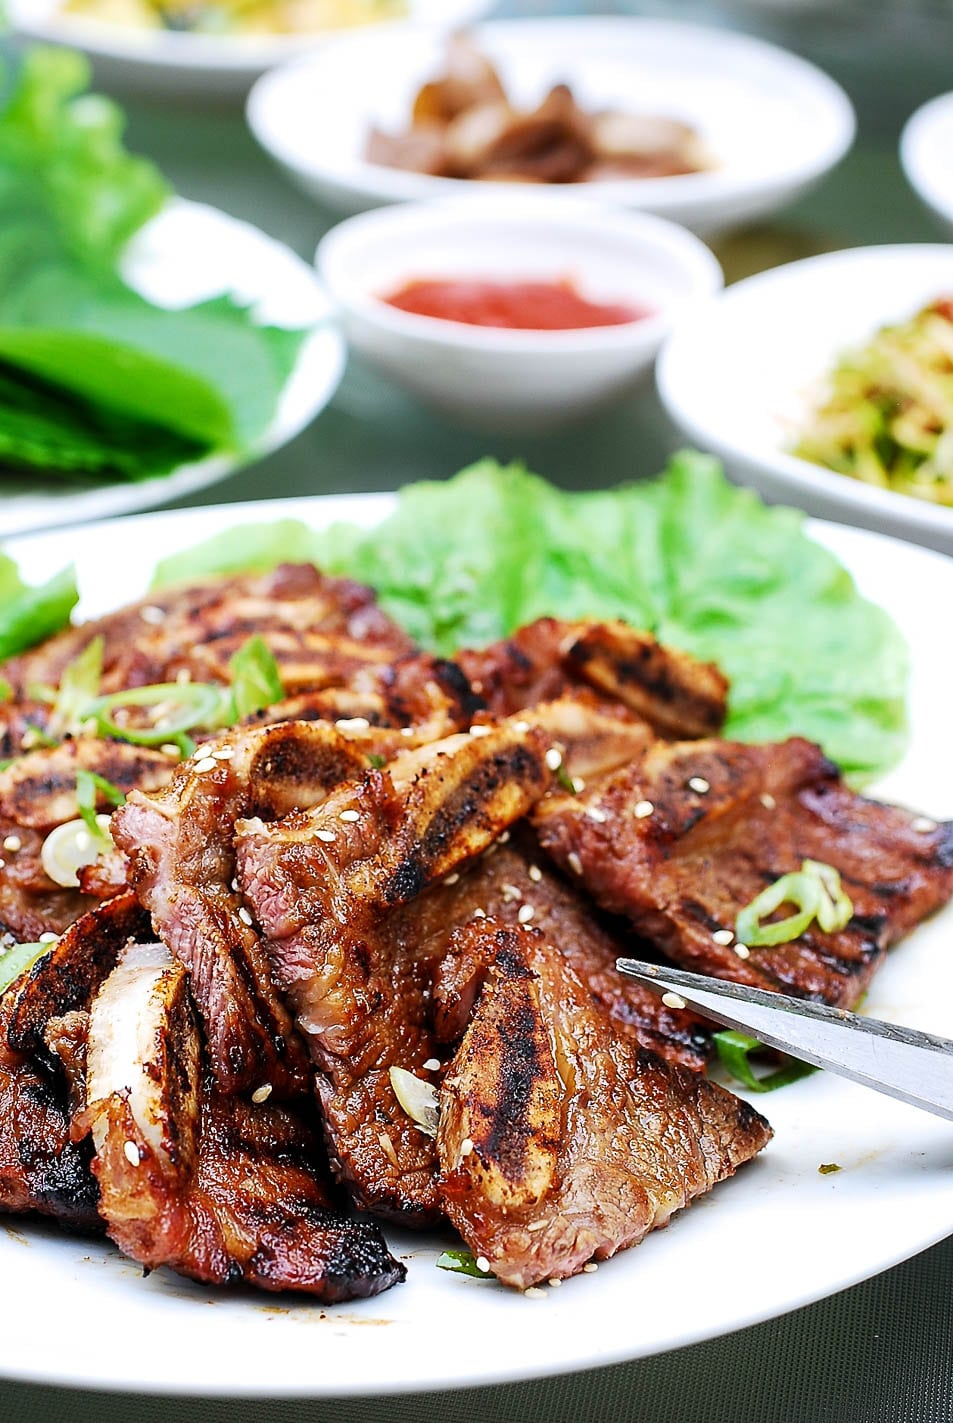 DSC 1852 3 - LA Galbi (Korean BBQ Short Ribs)